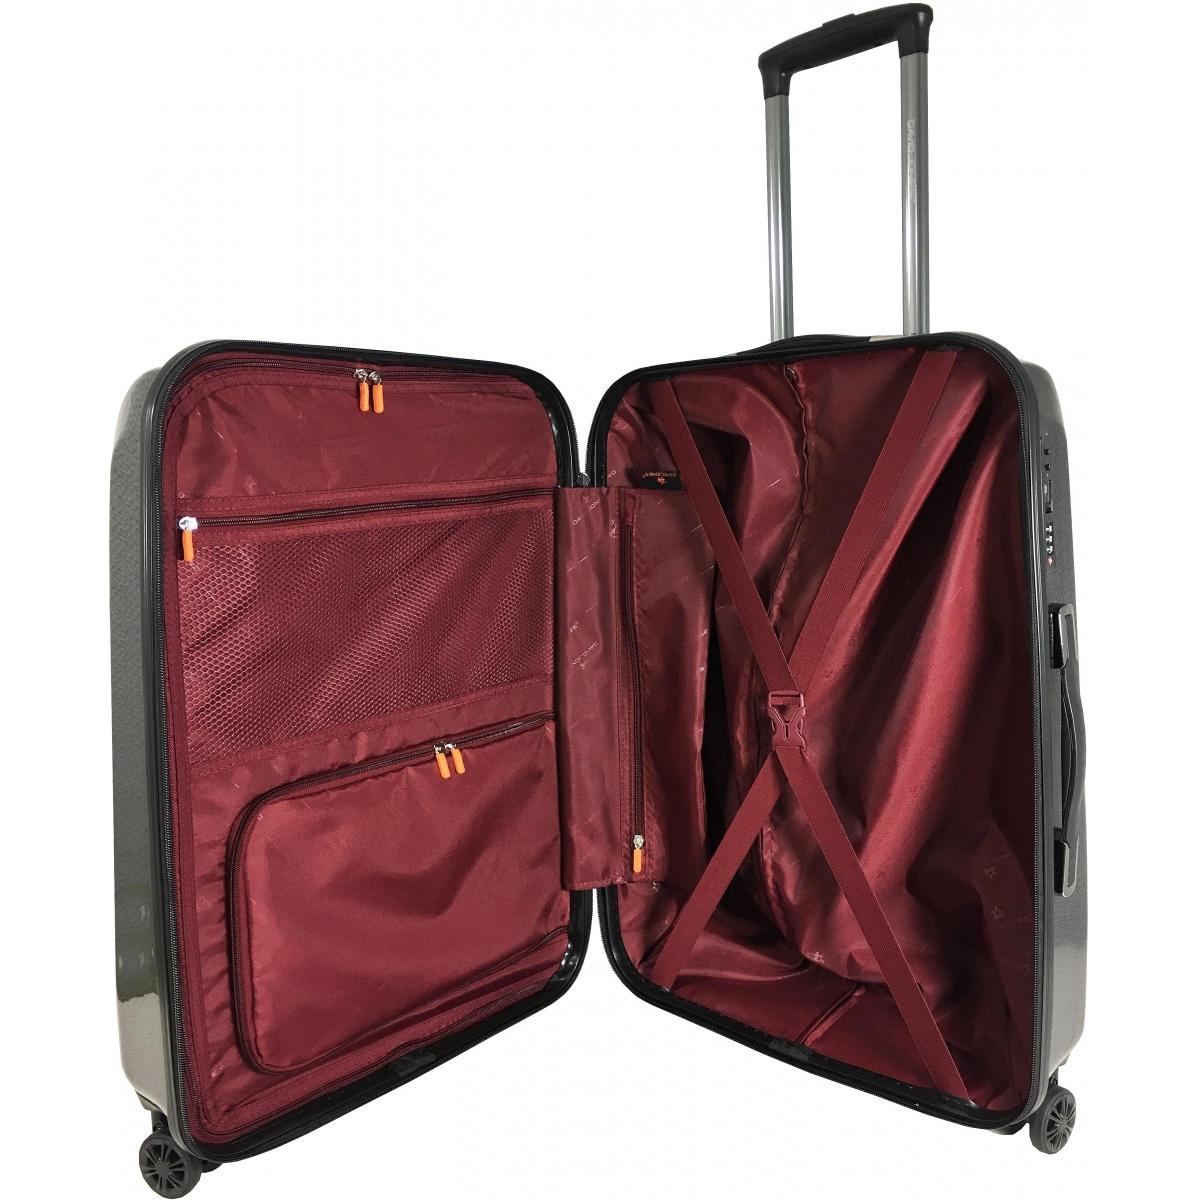 valise rigide david jones grande taille 77 cm noir ba20691g couleur principale noir. Black Bedroom Furniture Sets. Home Design Ideas